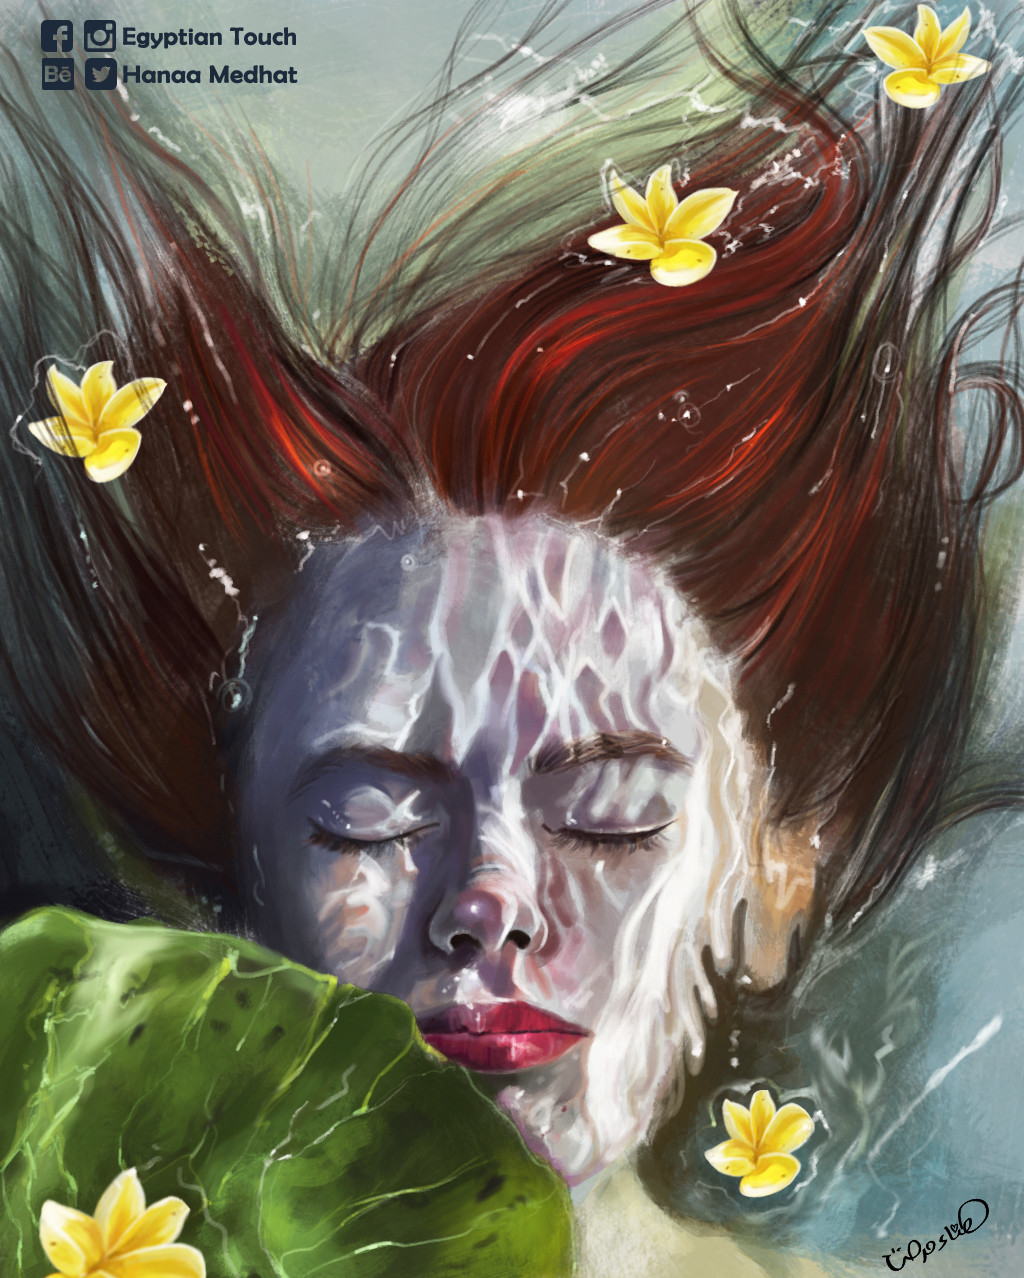 Hanaa medhat underwater